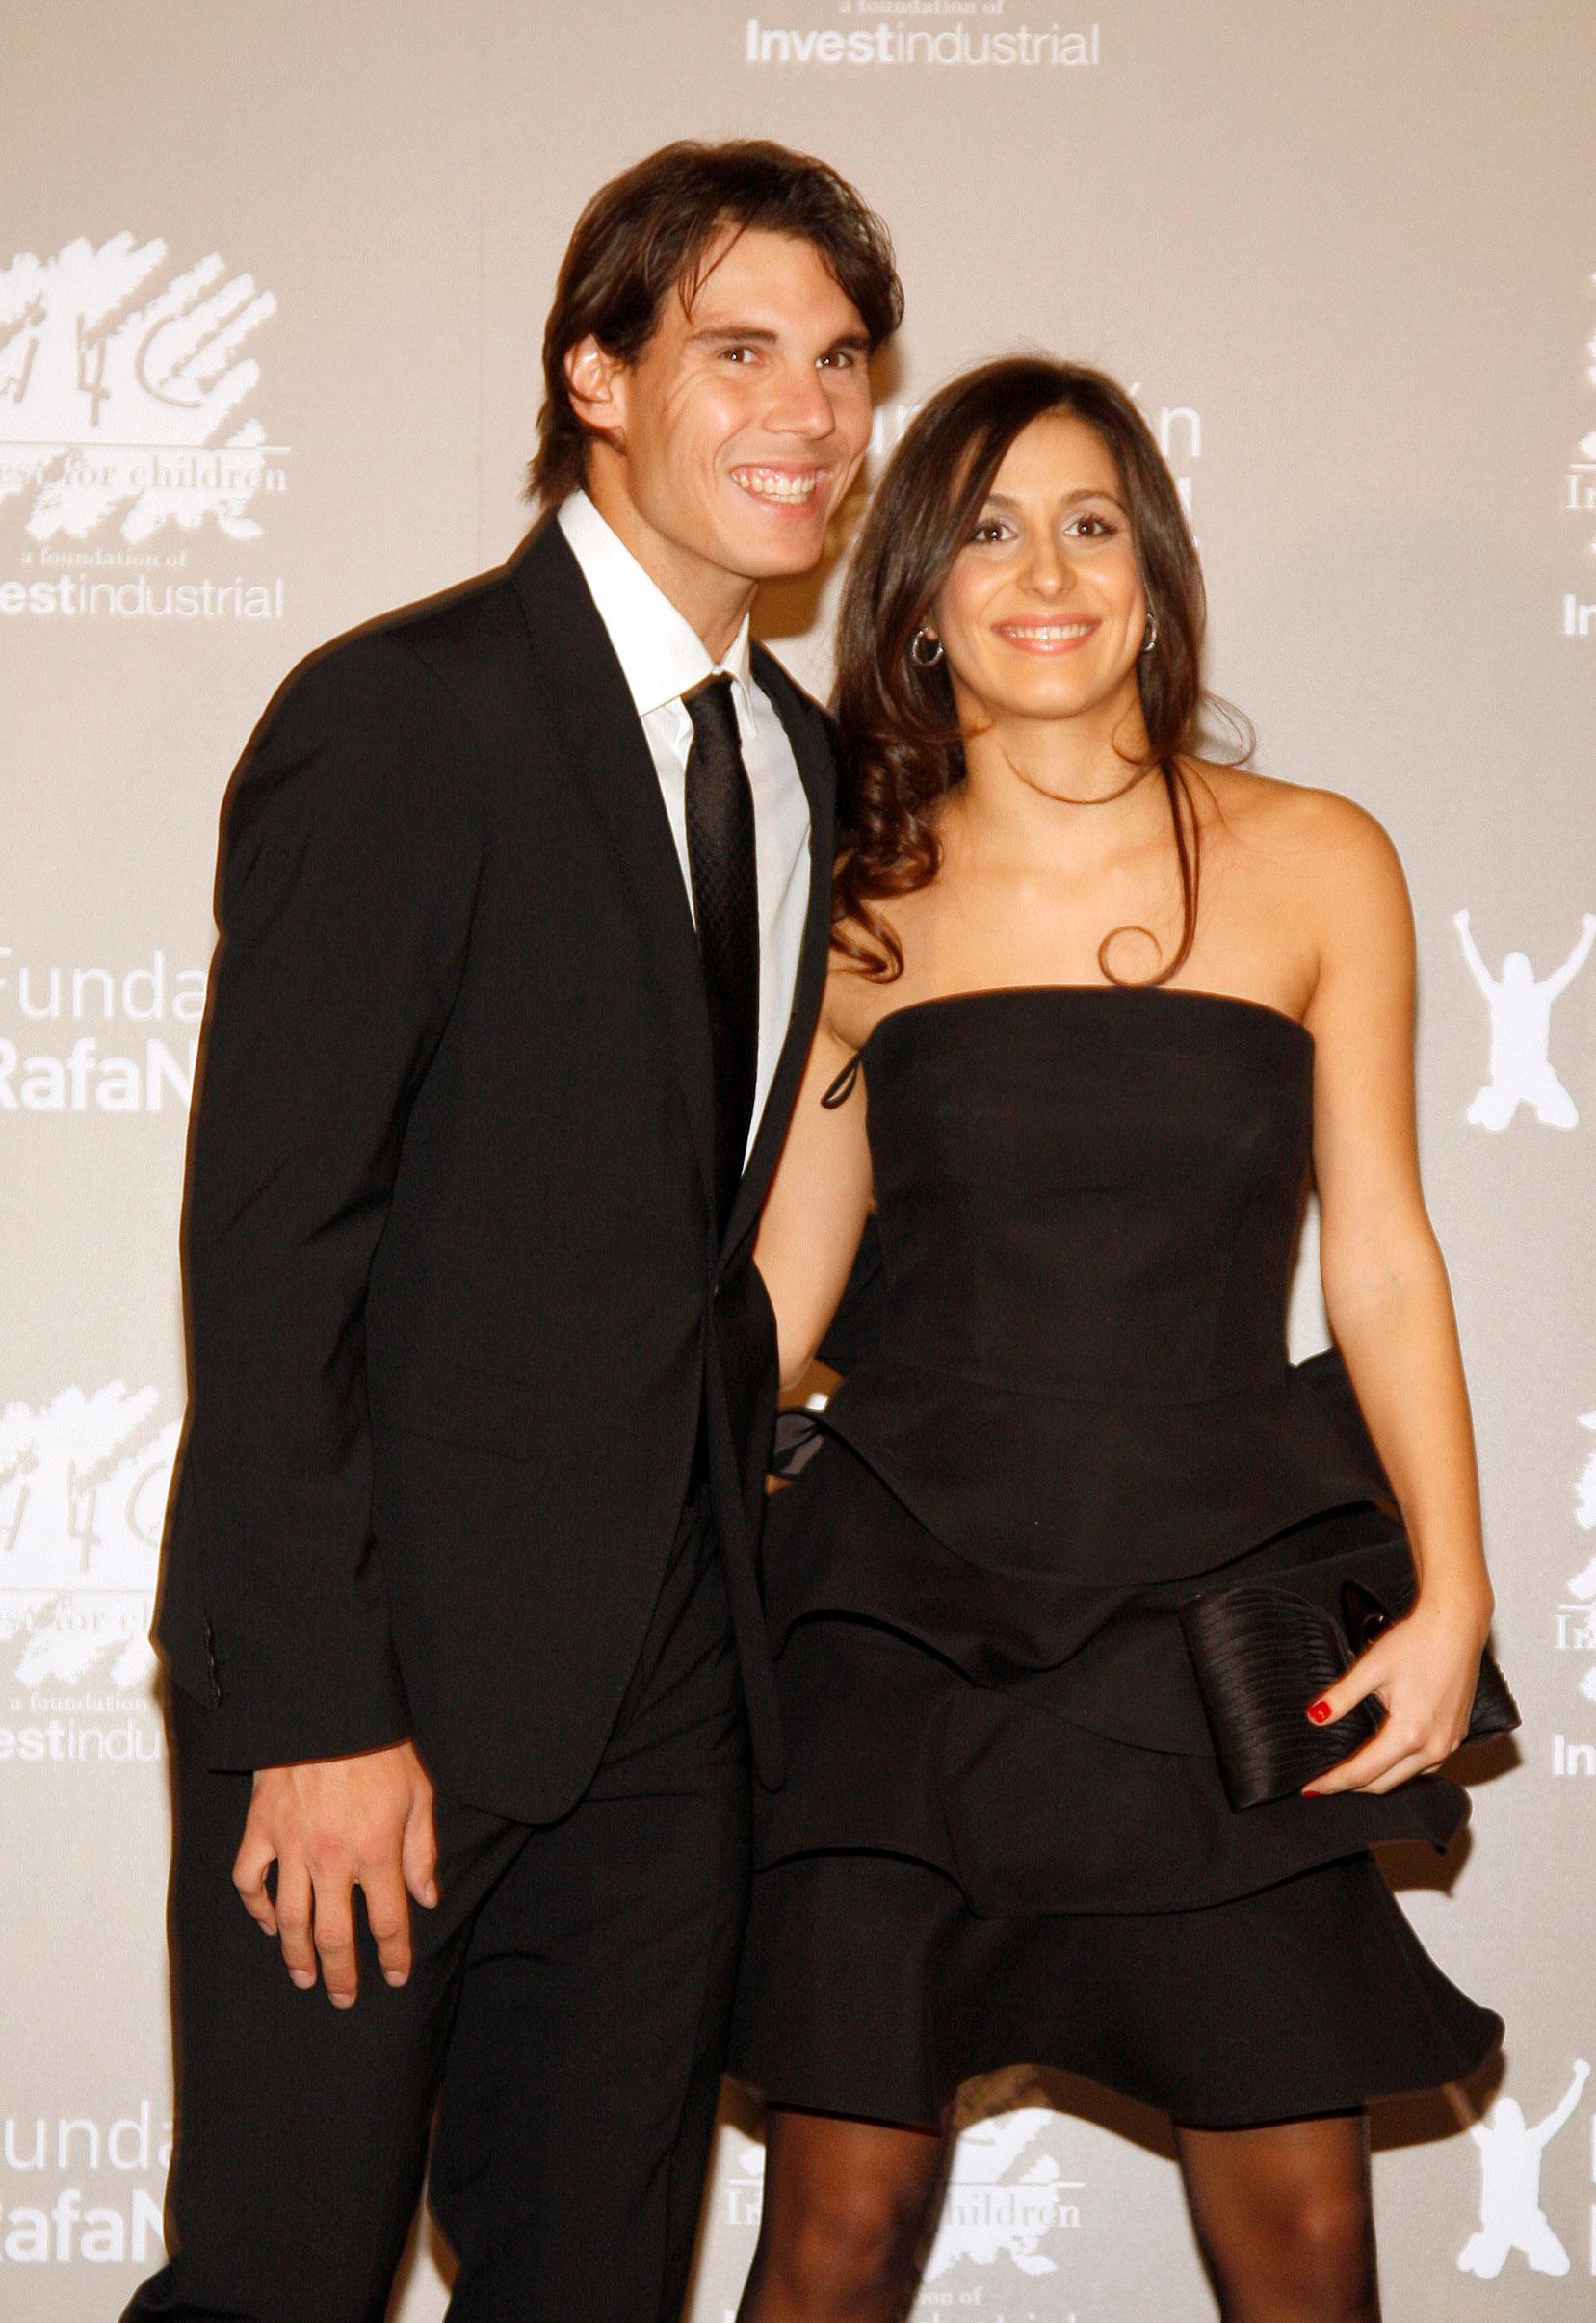 BARCELONA, SPAIN - DECEMBER 15:  Rafa Nadal and Maria Francisca Perello